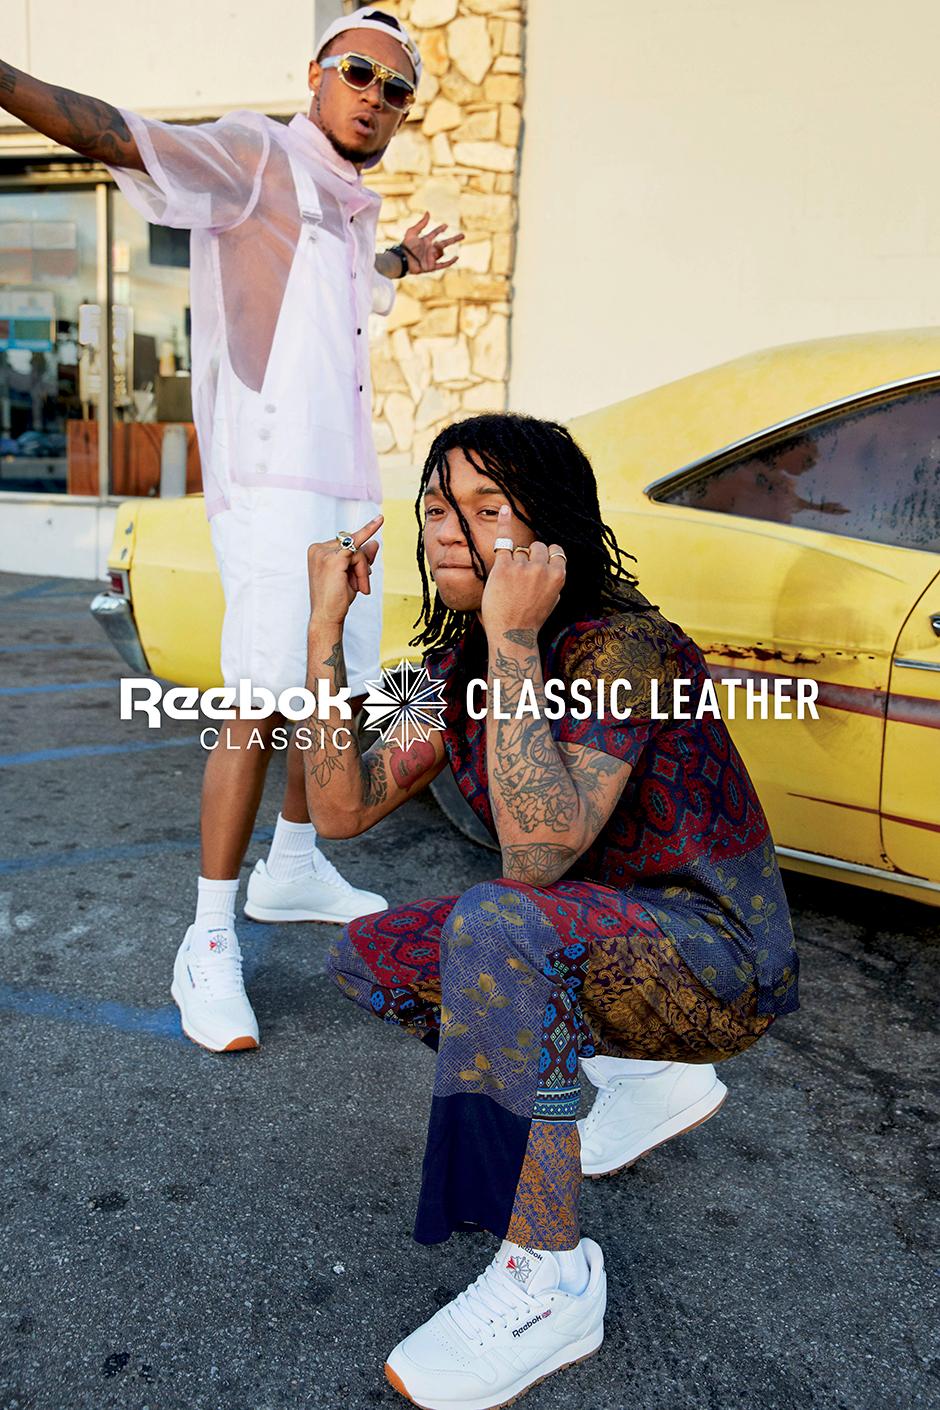 d5b42961203 Rae Sremmurd Reebok Classic Leather Campaign